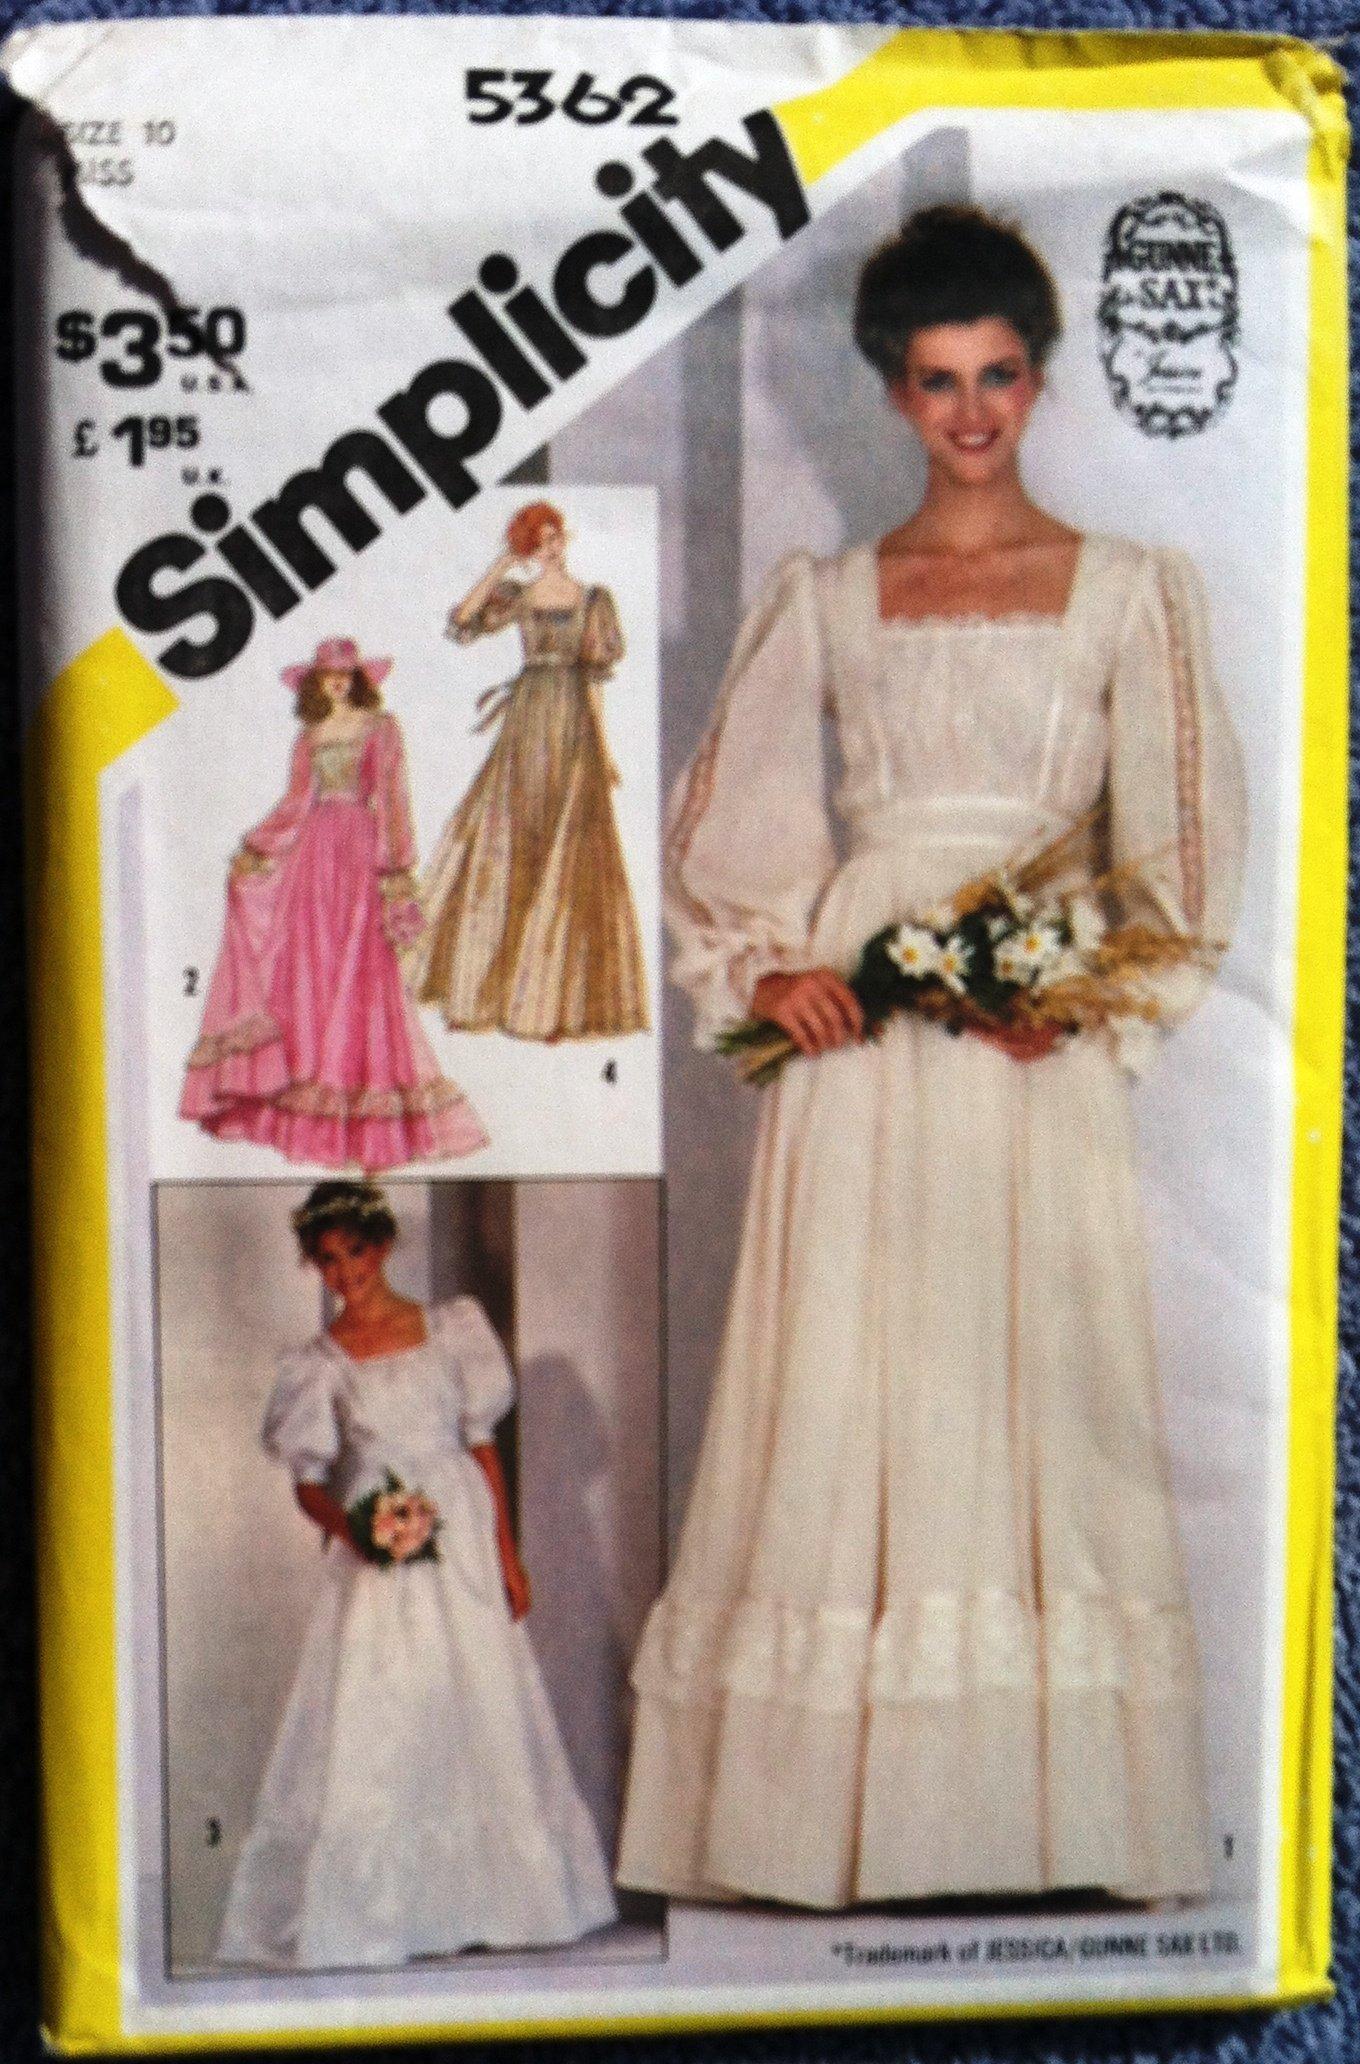 Simplicity 5362 Jessica Mcclintock Gunne Sax Misses Size 10 Wedding Dress Bridesmaid Gown Sewing Pattern Simplicity Amazon Com Books